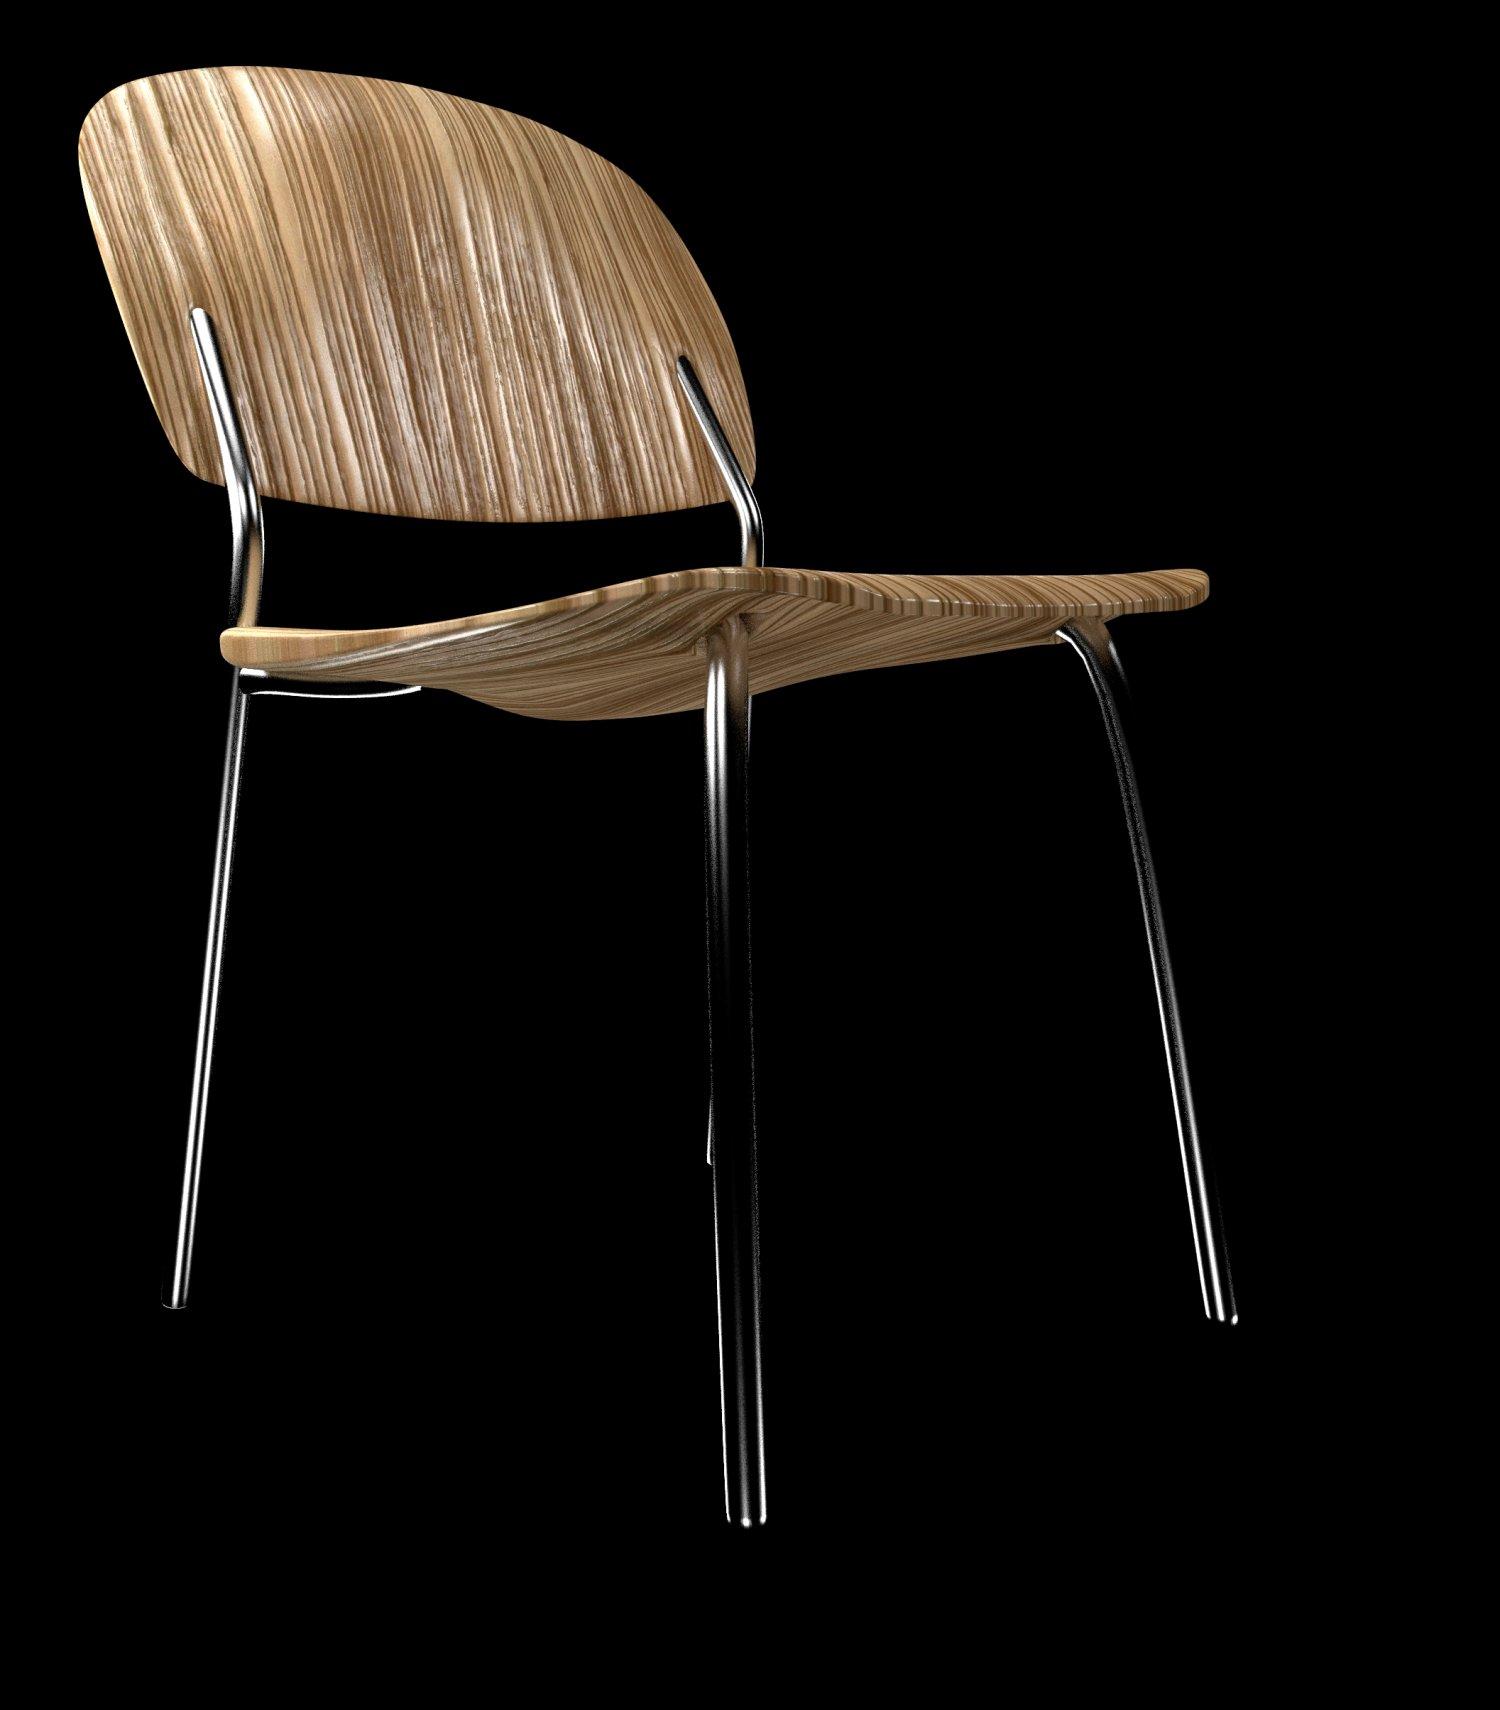 Beau Zebra Wood Chair. Remove Bookmark Bookmark This Item